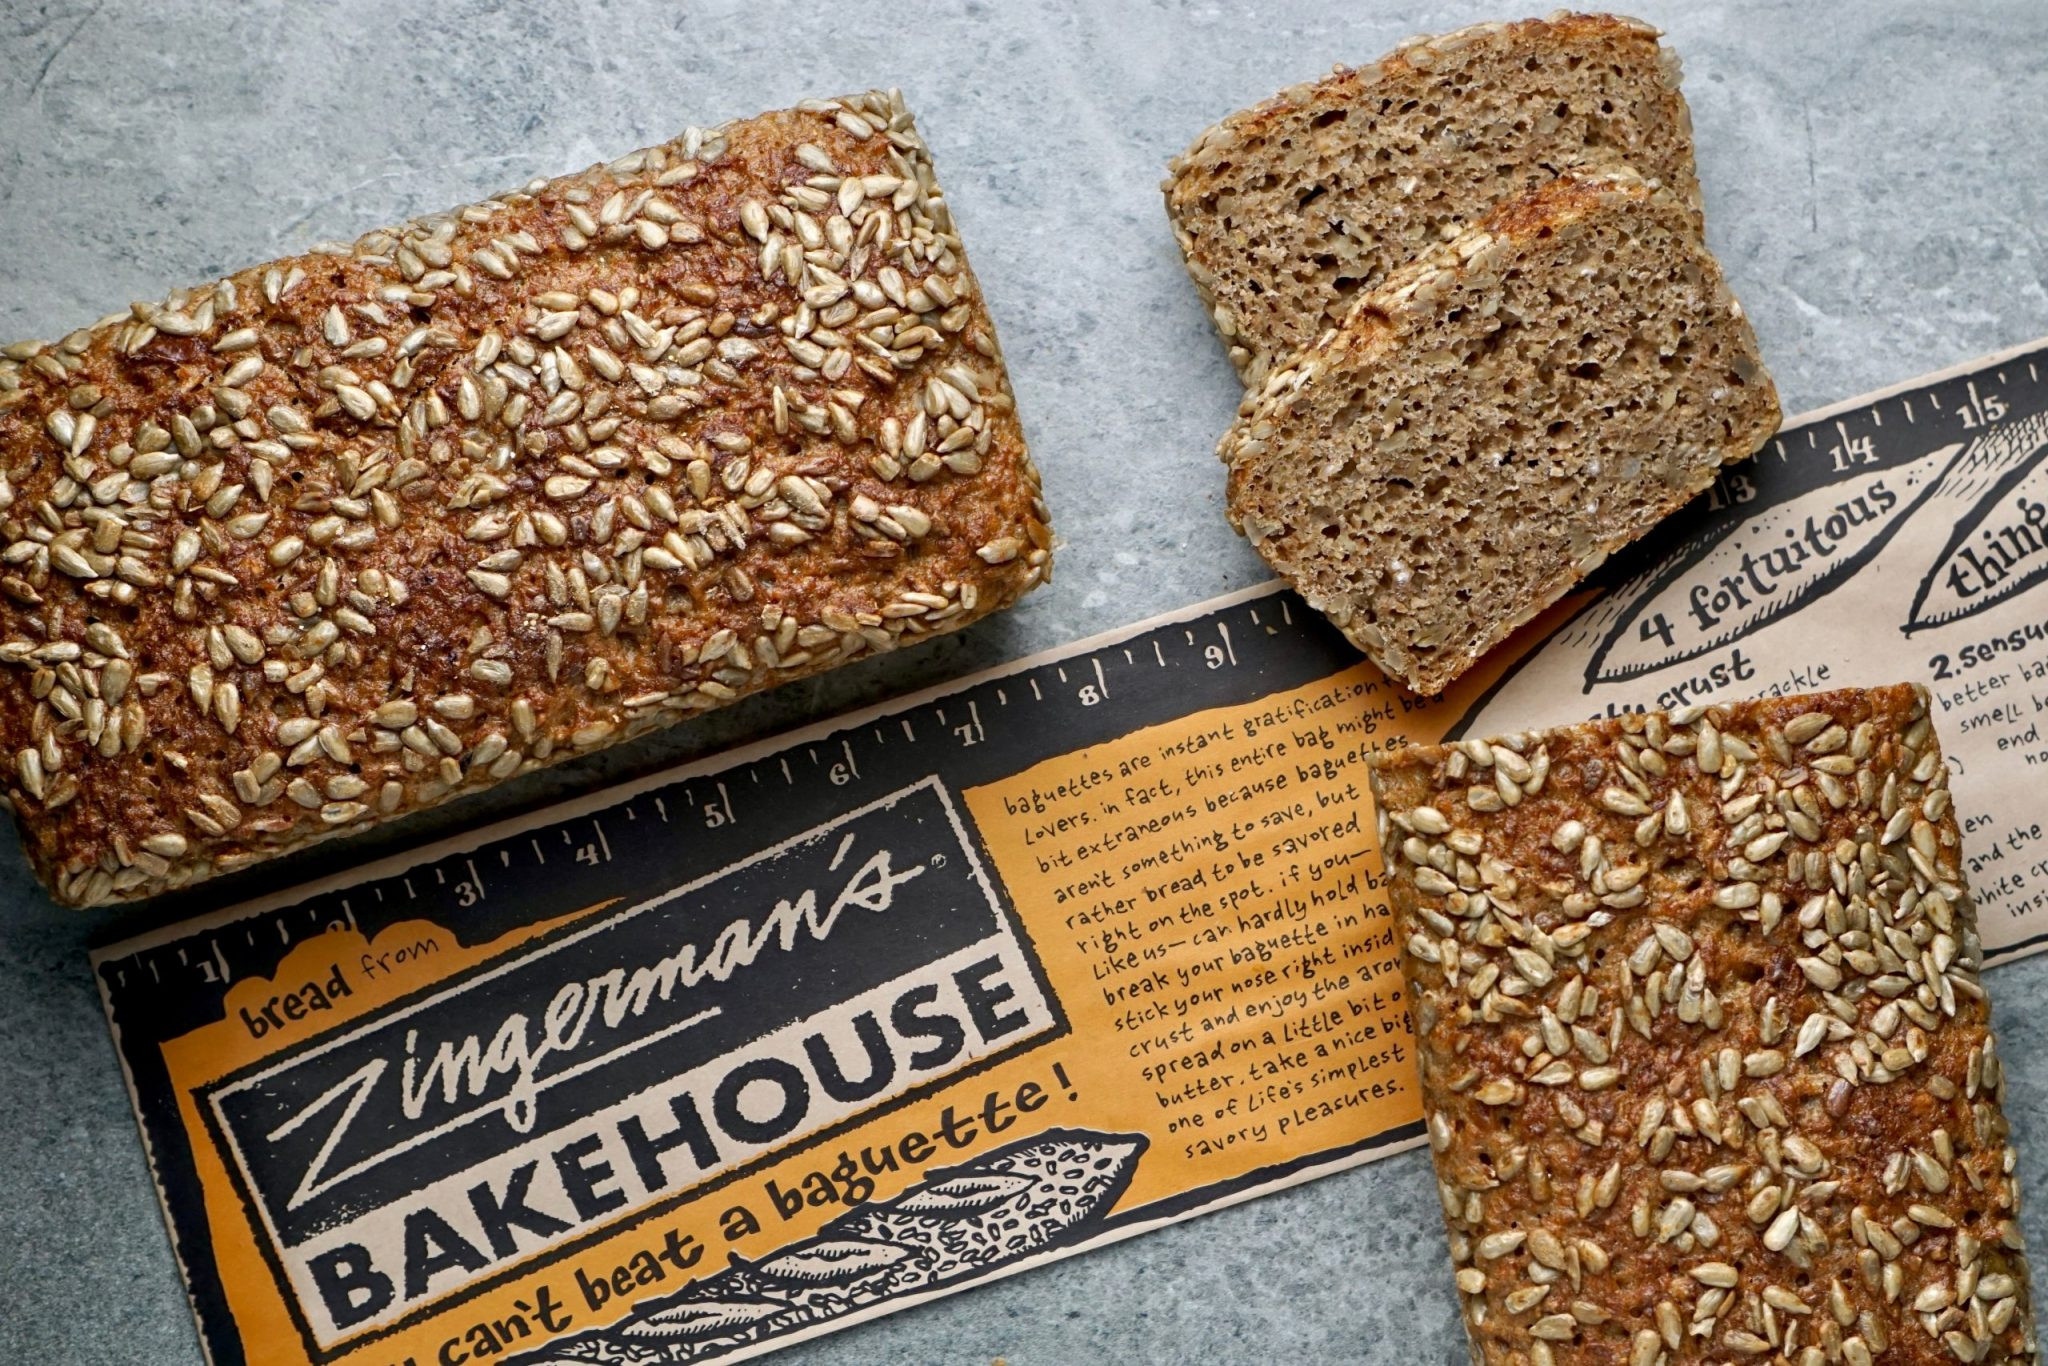 Dinkelbrot - German Spelt Bread